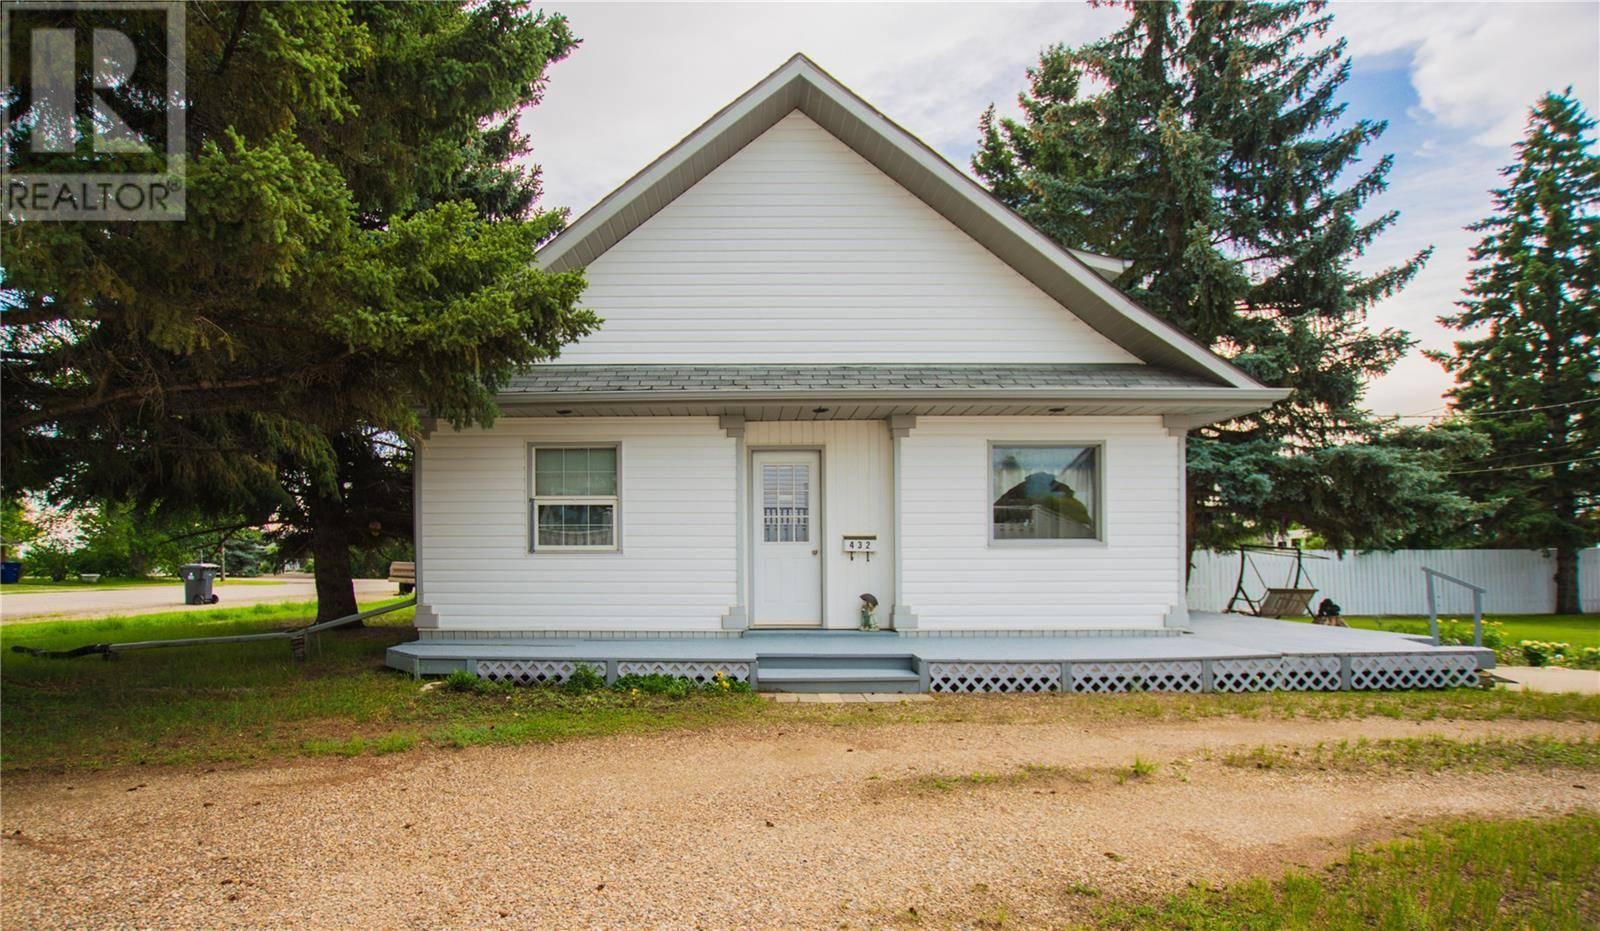 House for sale at 432 Main St E Langham Saskatchewan - MLS: SK781948